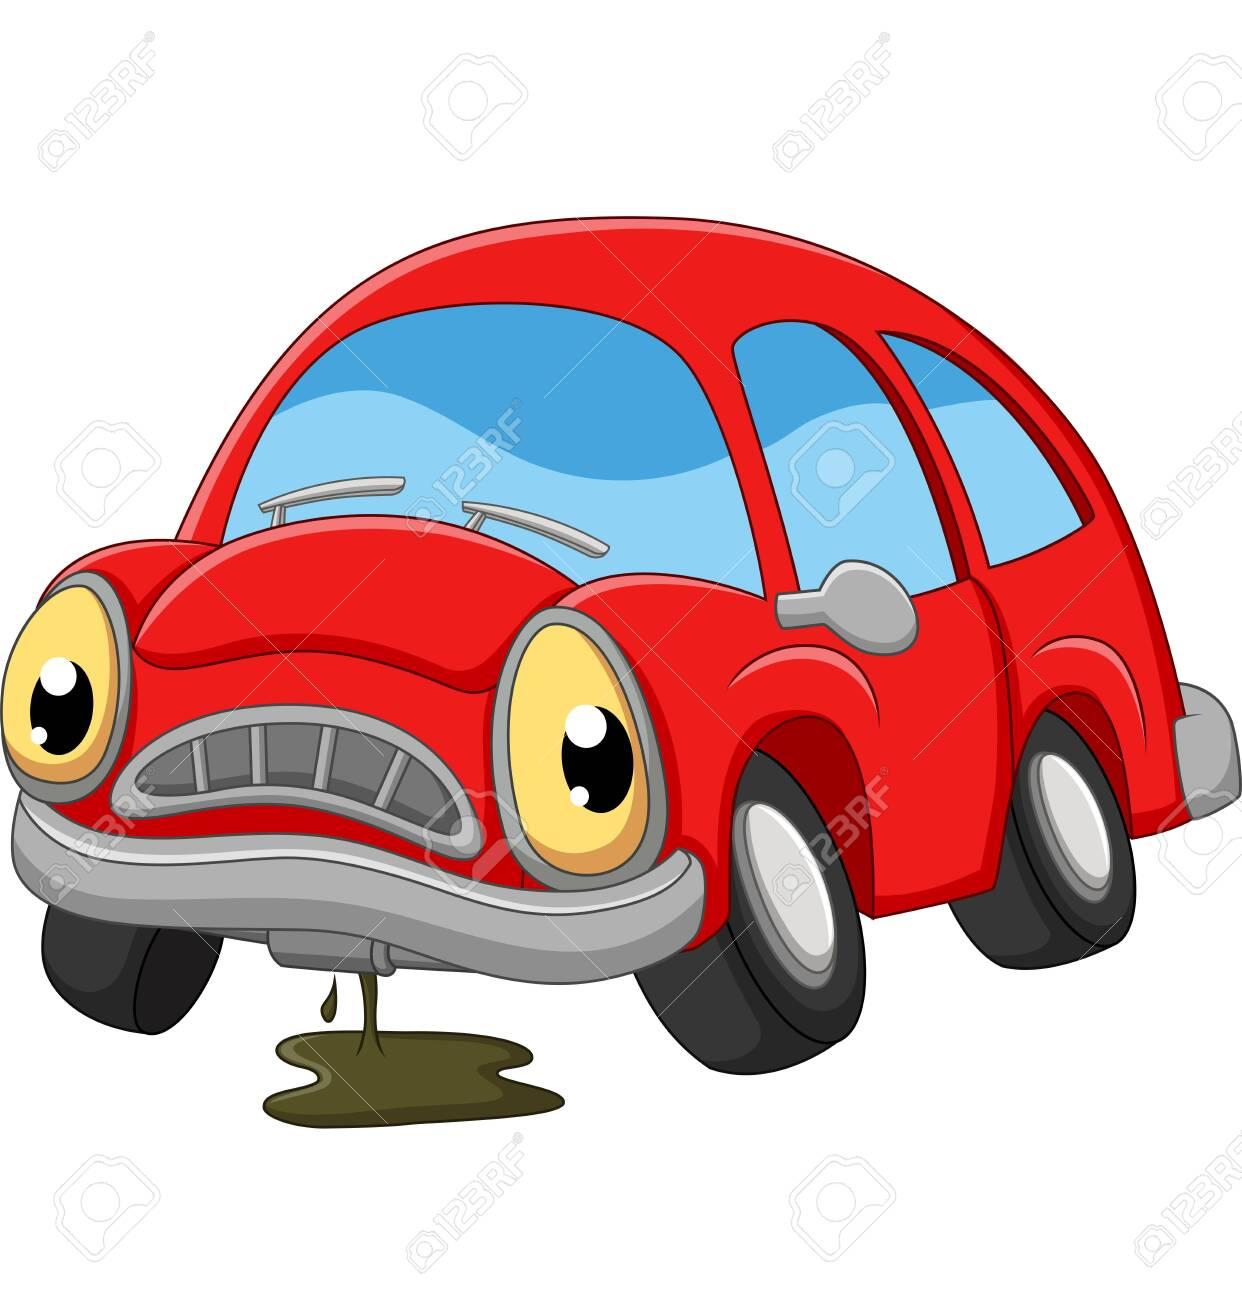 Cartoon red car sad in need of repair - 126484312